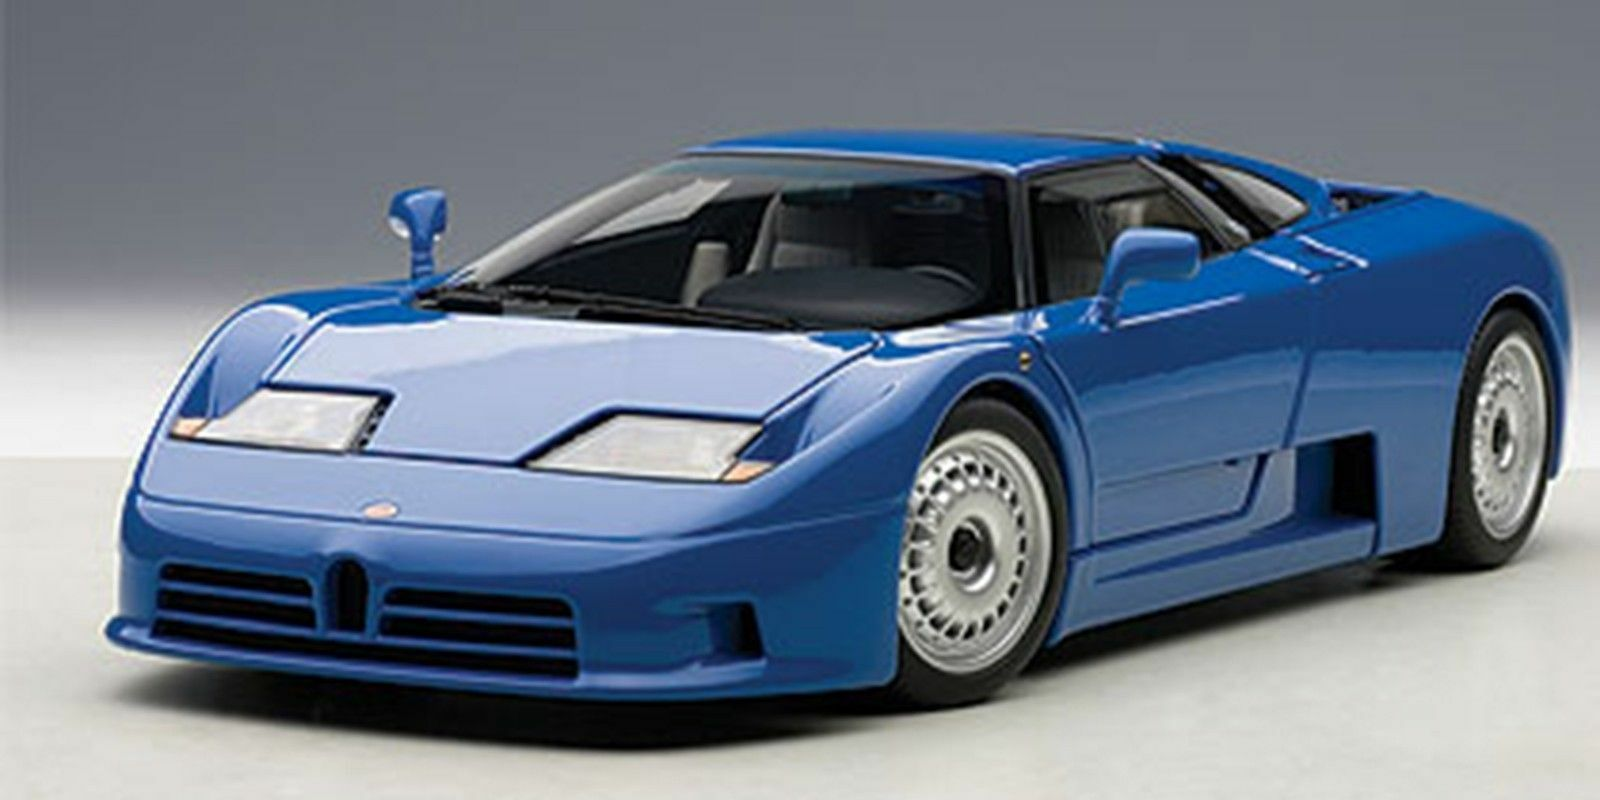 mejor oferta Autoart Bugatti EB110 gt azul oscuro 1 18 Nuevo     venta caliente